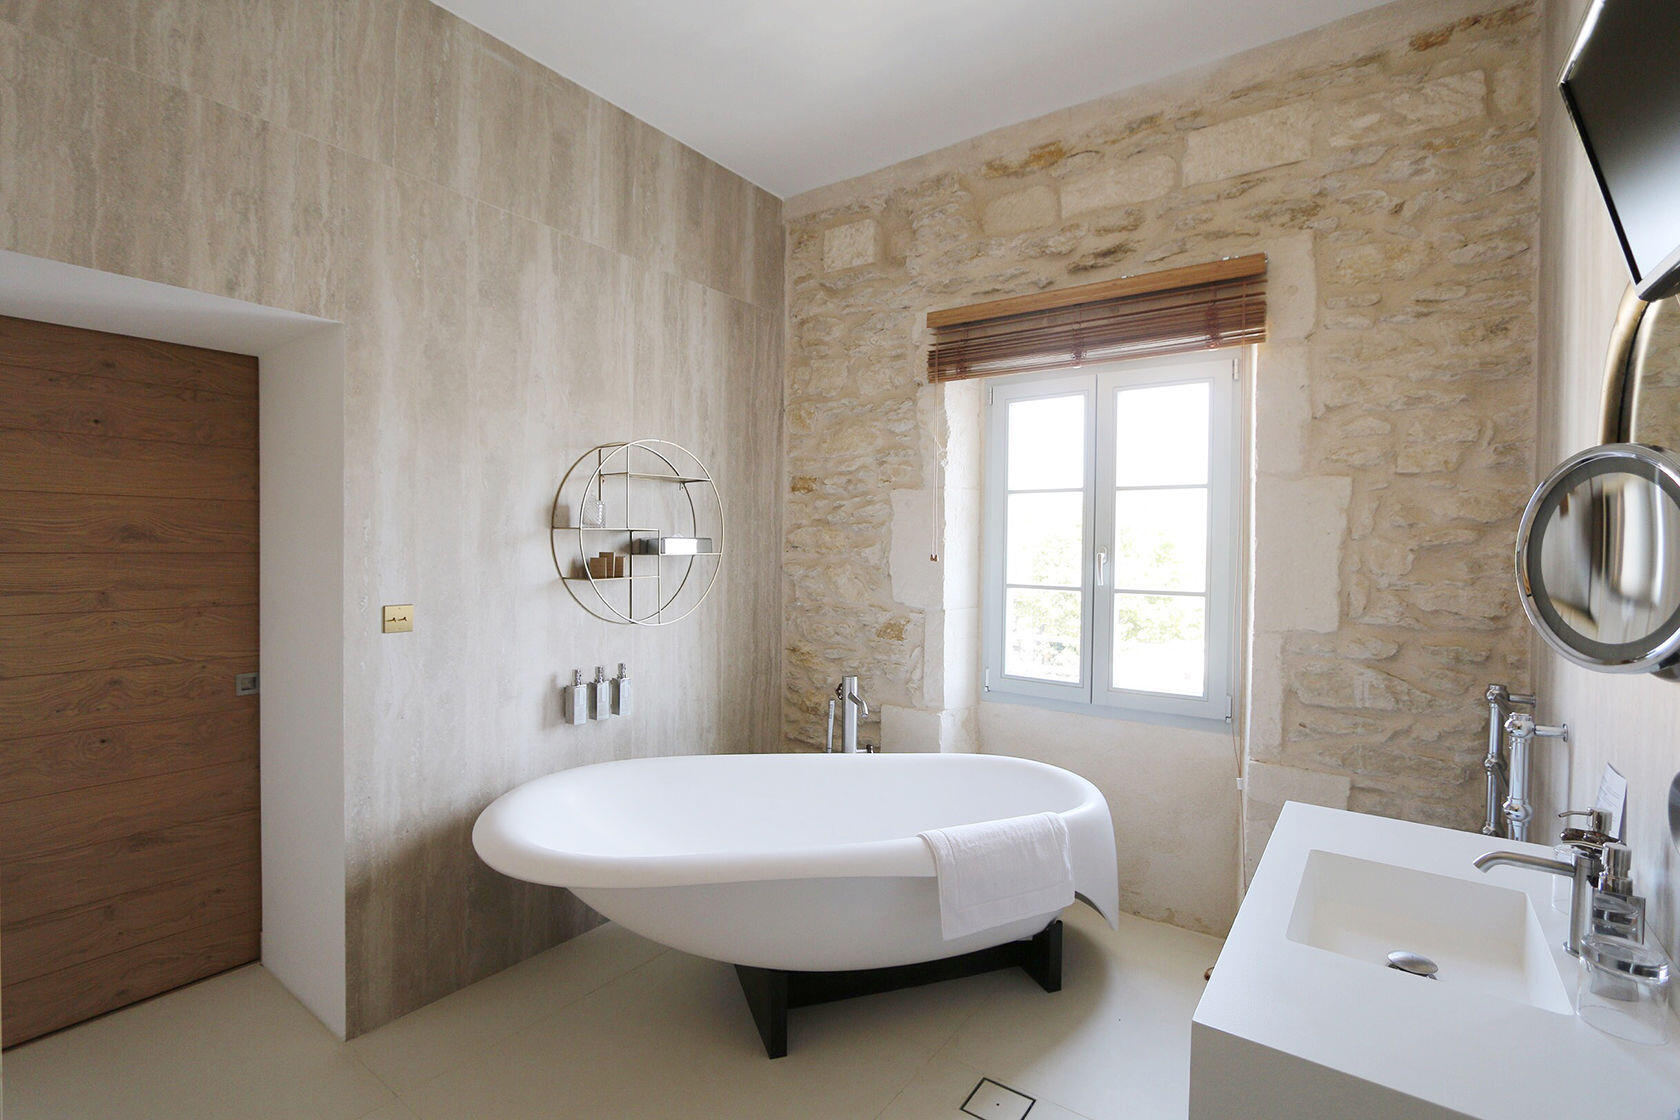 Hotel Le Saint-Remy Luxury Chambre Prestige Hippie